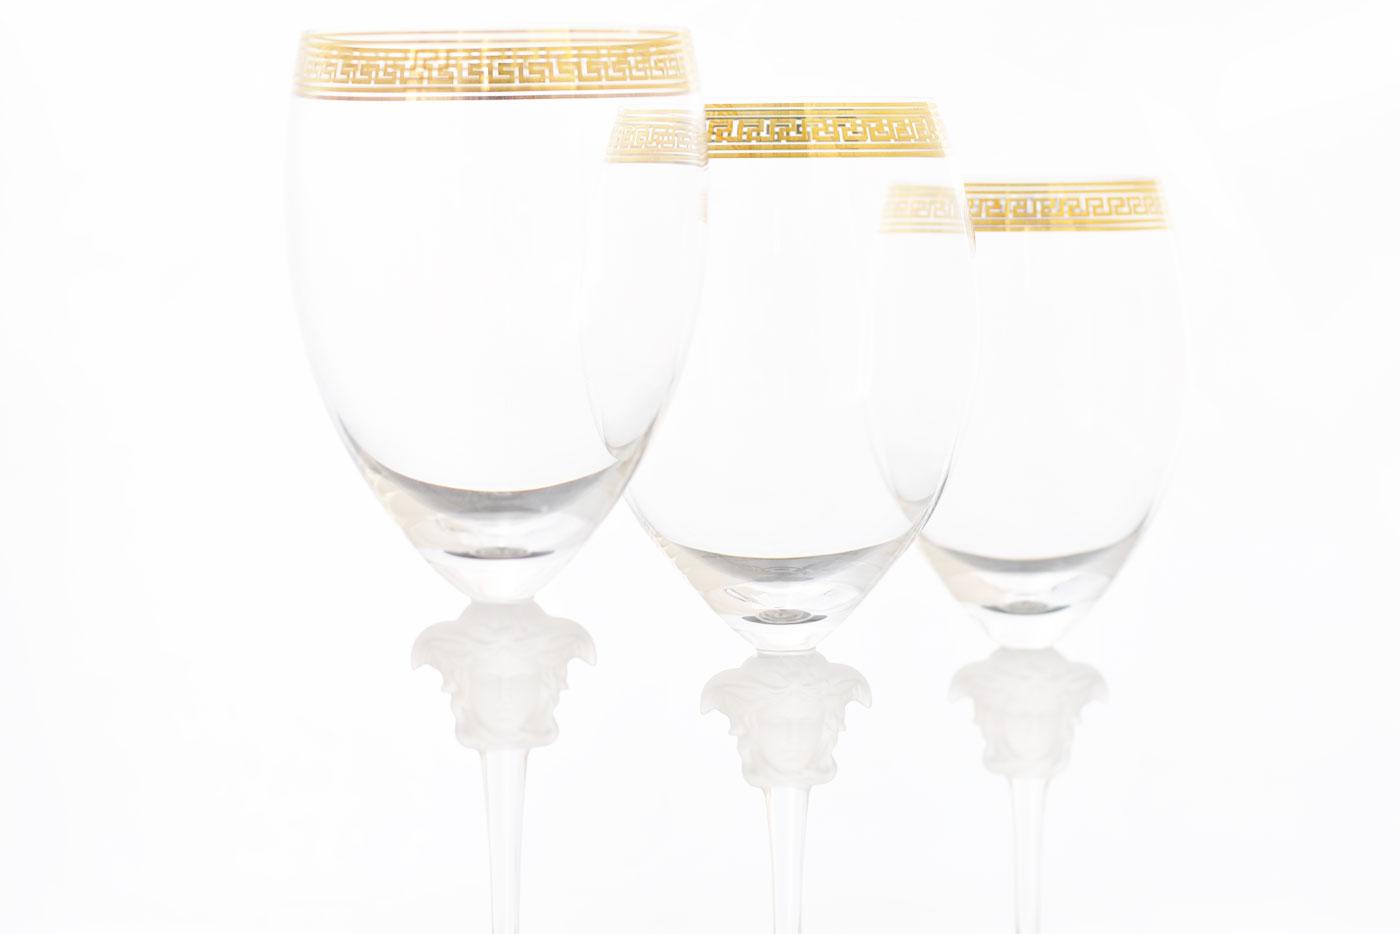 I bicchieri a tavola tasteofrunway - Disposizione bicchieri in tavola ...